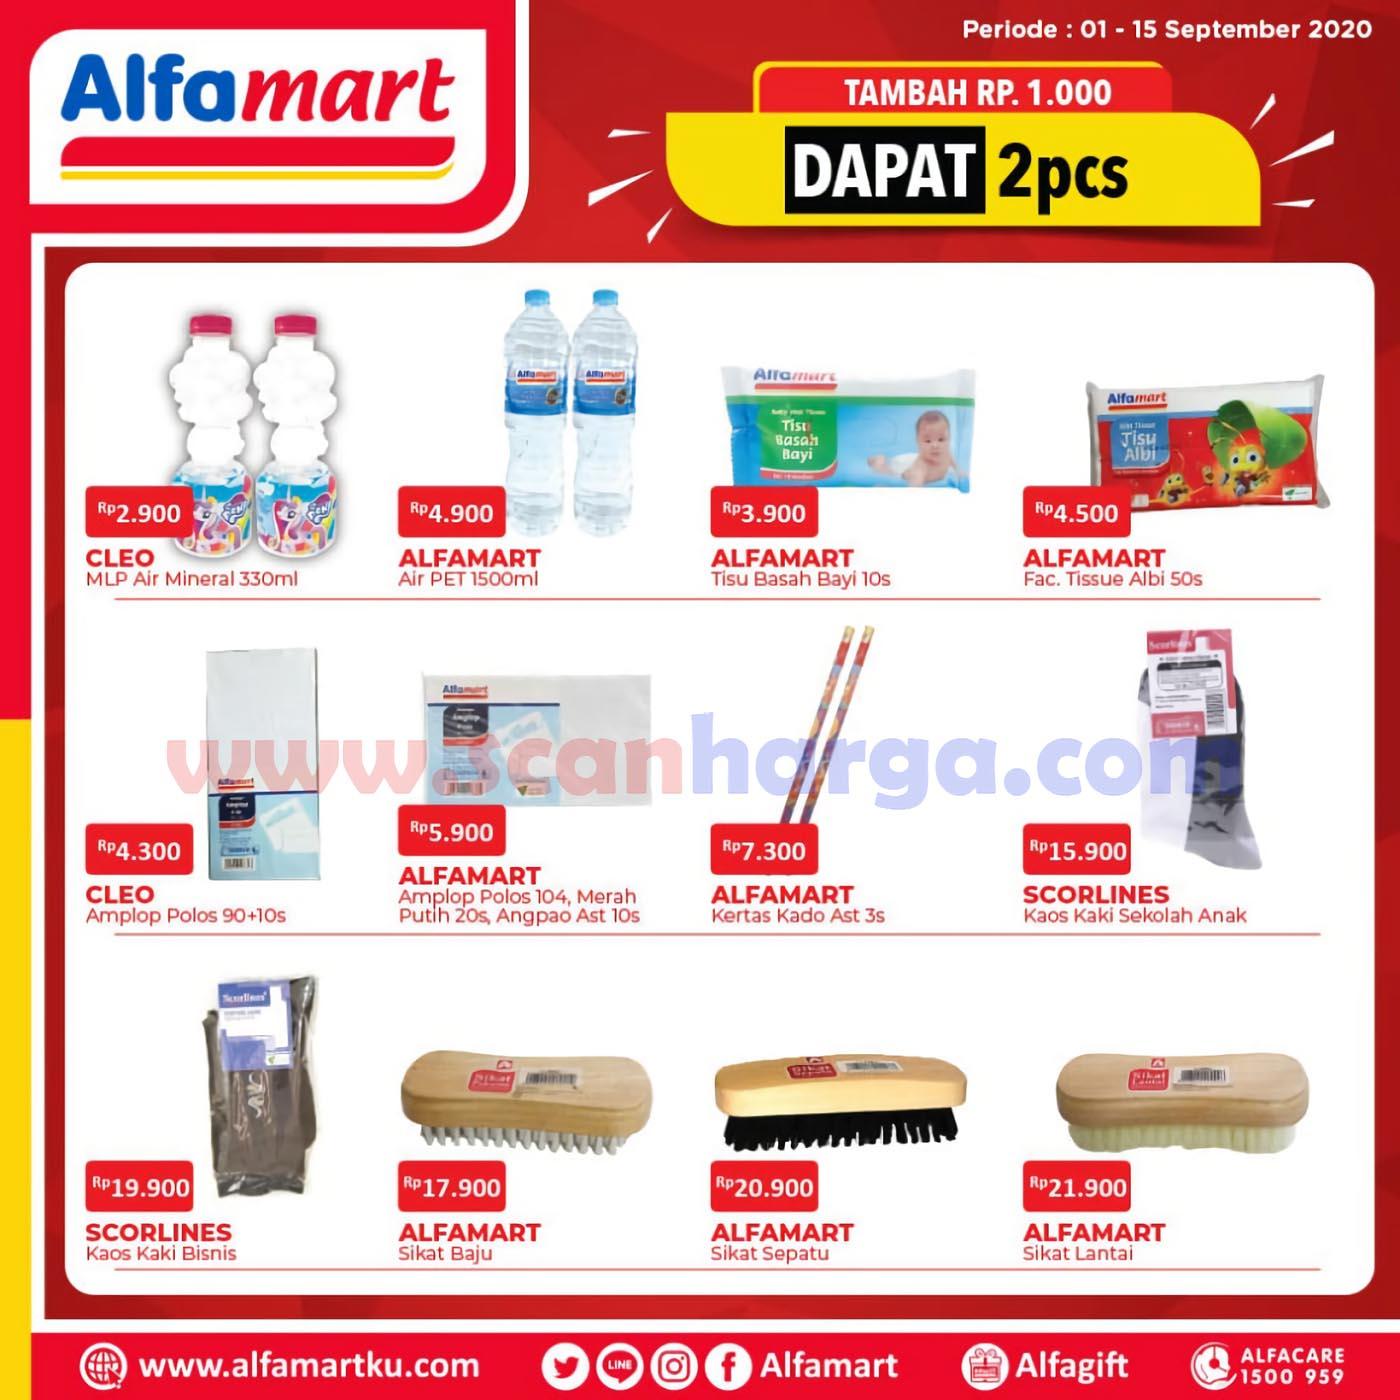 Alfamart Promo Tambah Rp +1.000 Dapat 2 Pcs Periode 1 - 15 September 2020